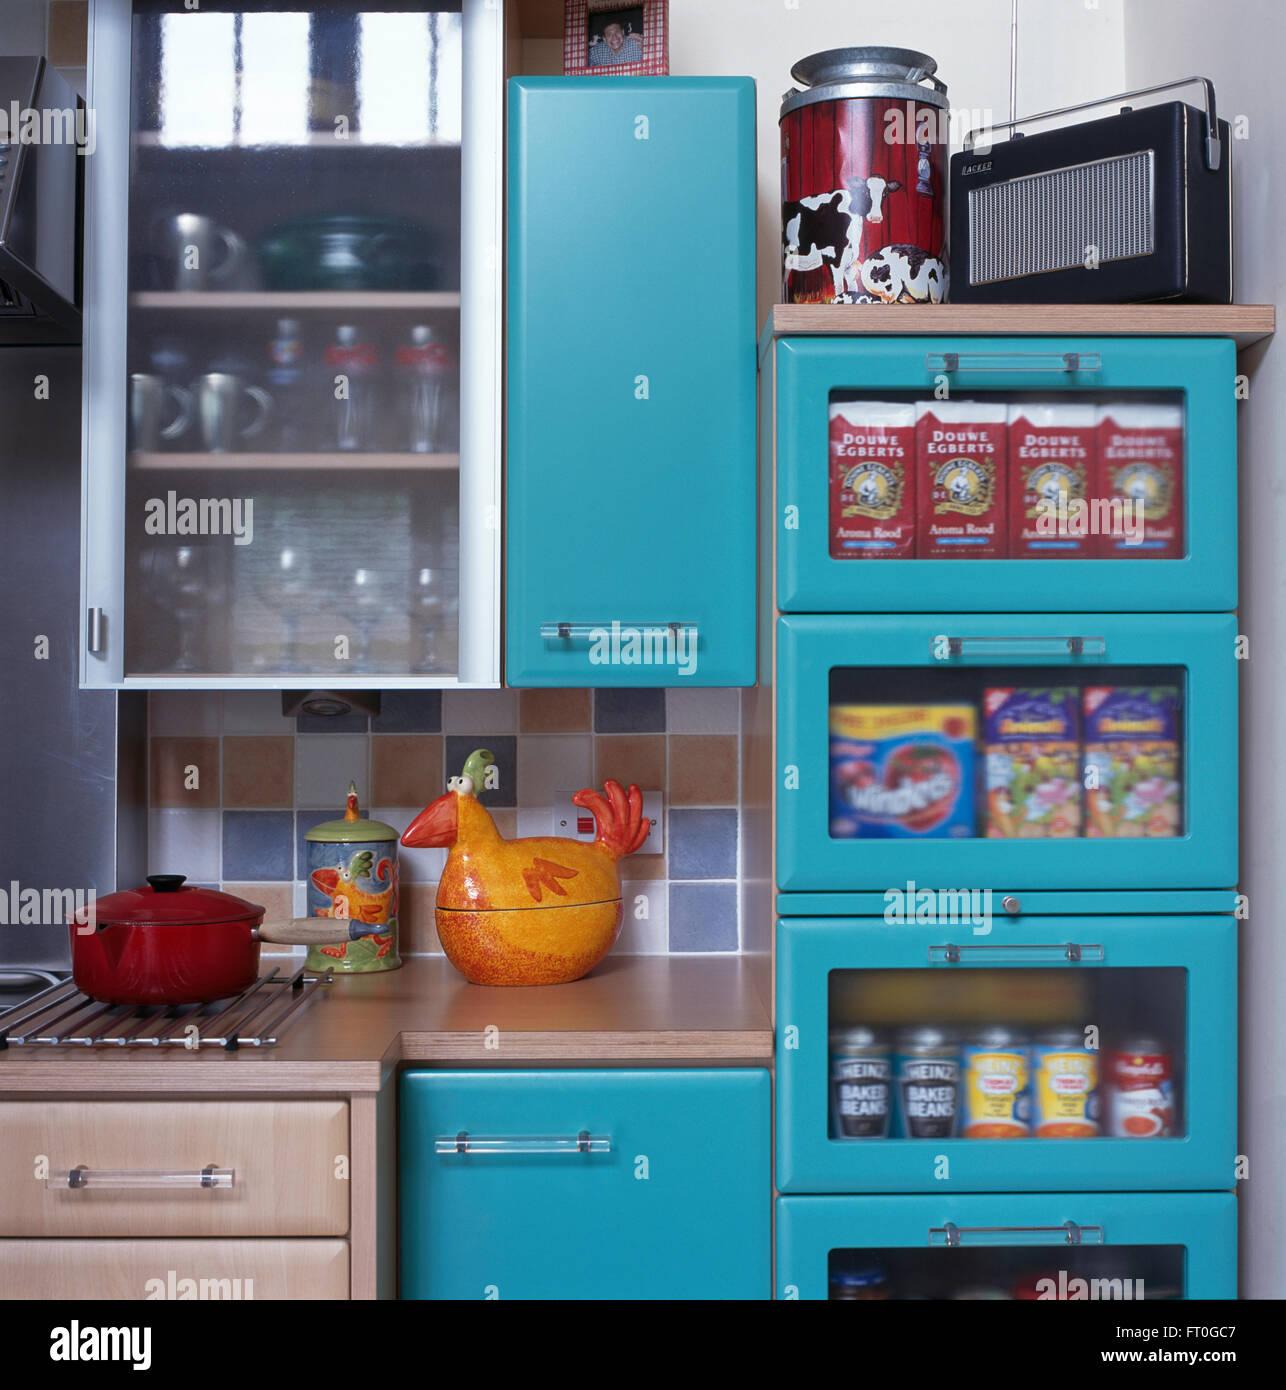 Interiors Kitchens Details Cupboards Stock Photos & Interiors ...